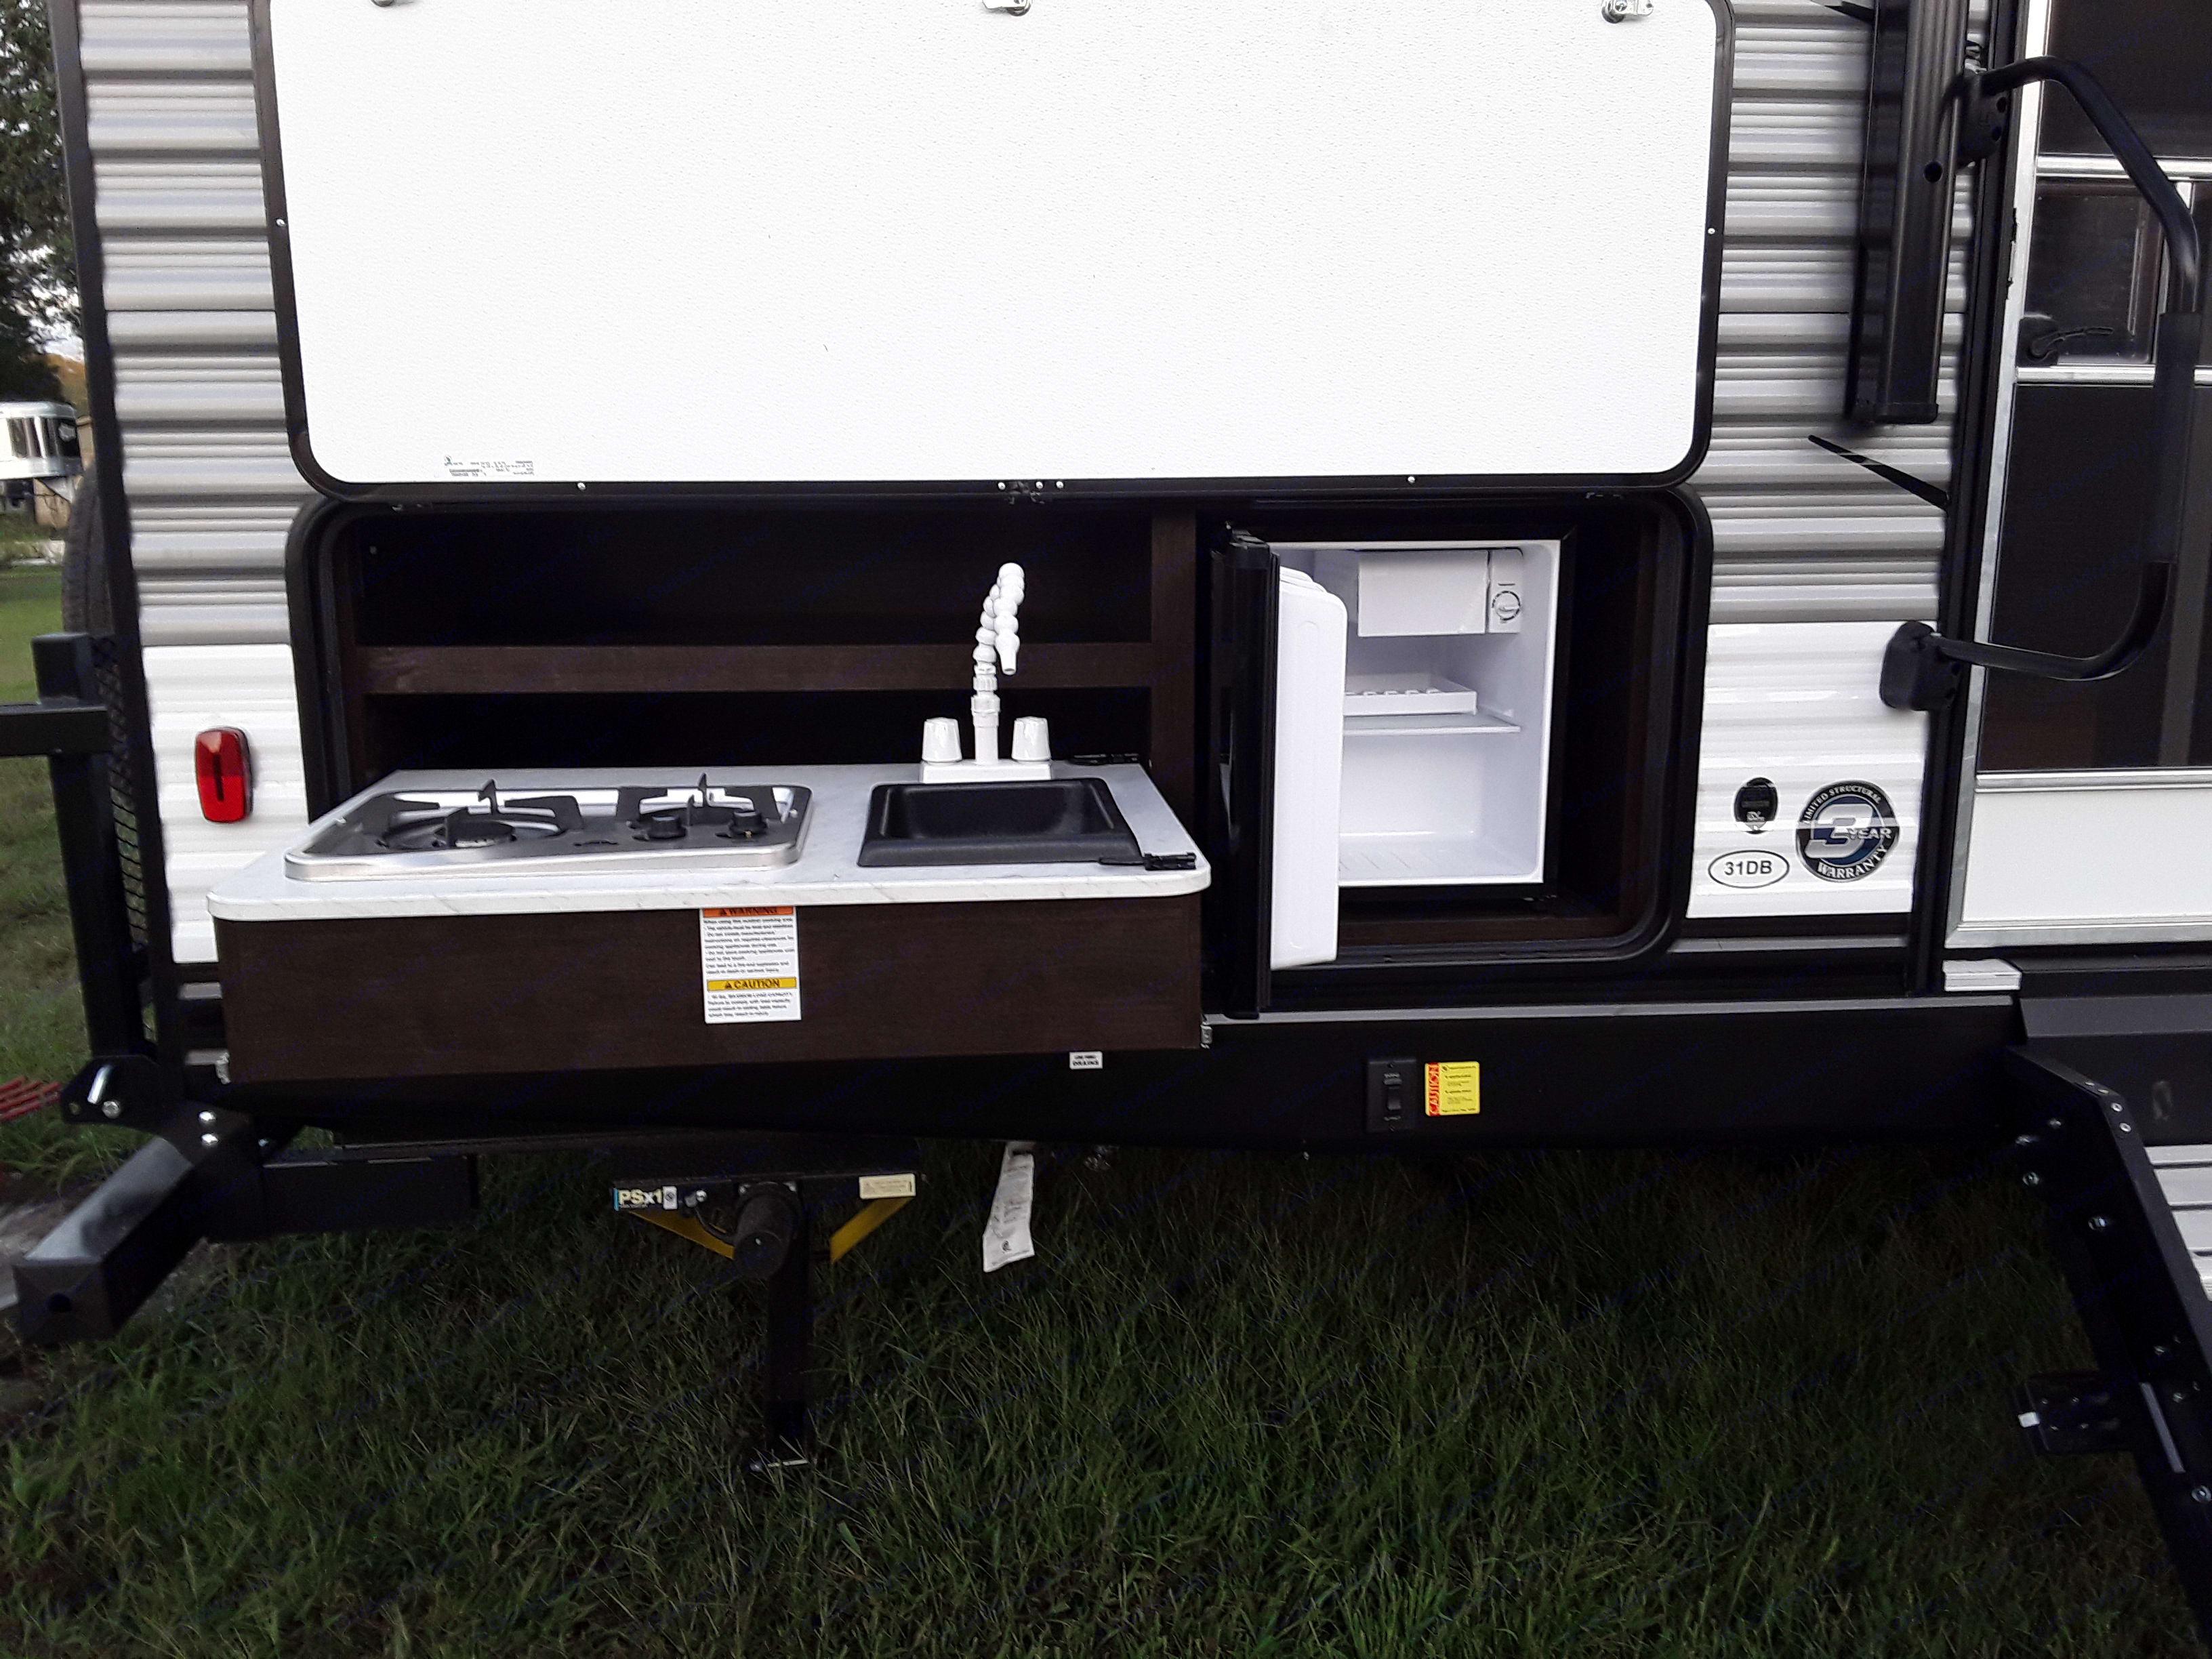 outdoor kitchen: stove, sink, and fridge/freezer. Heartland Trail Runner 2021